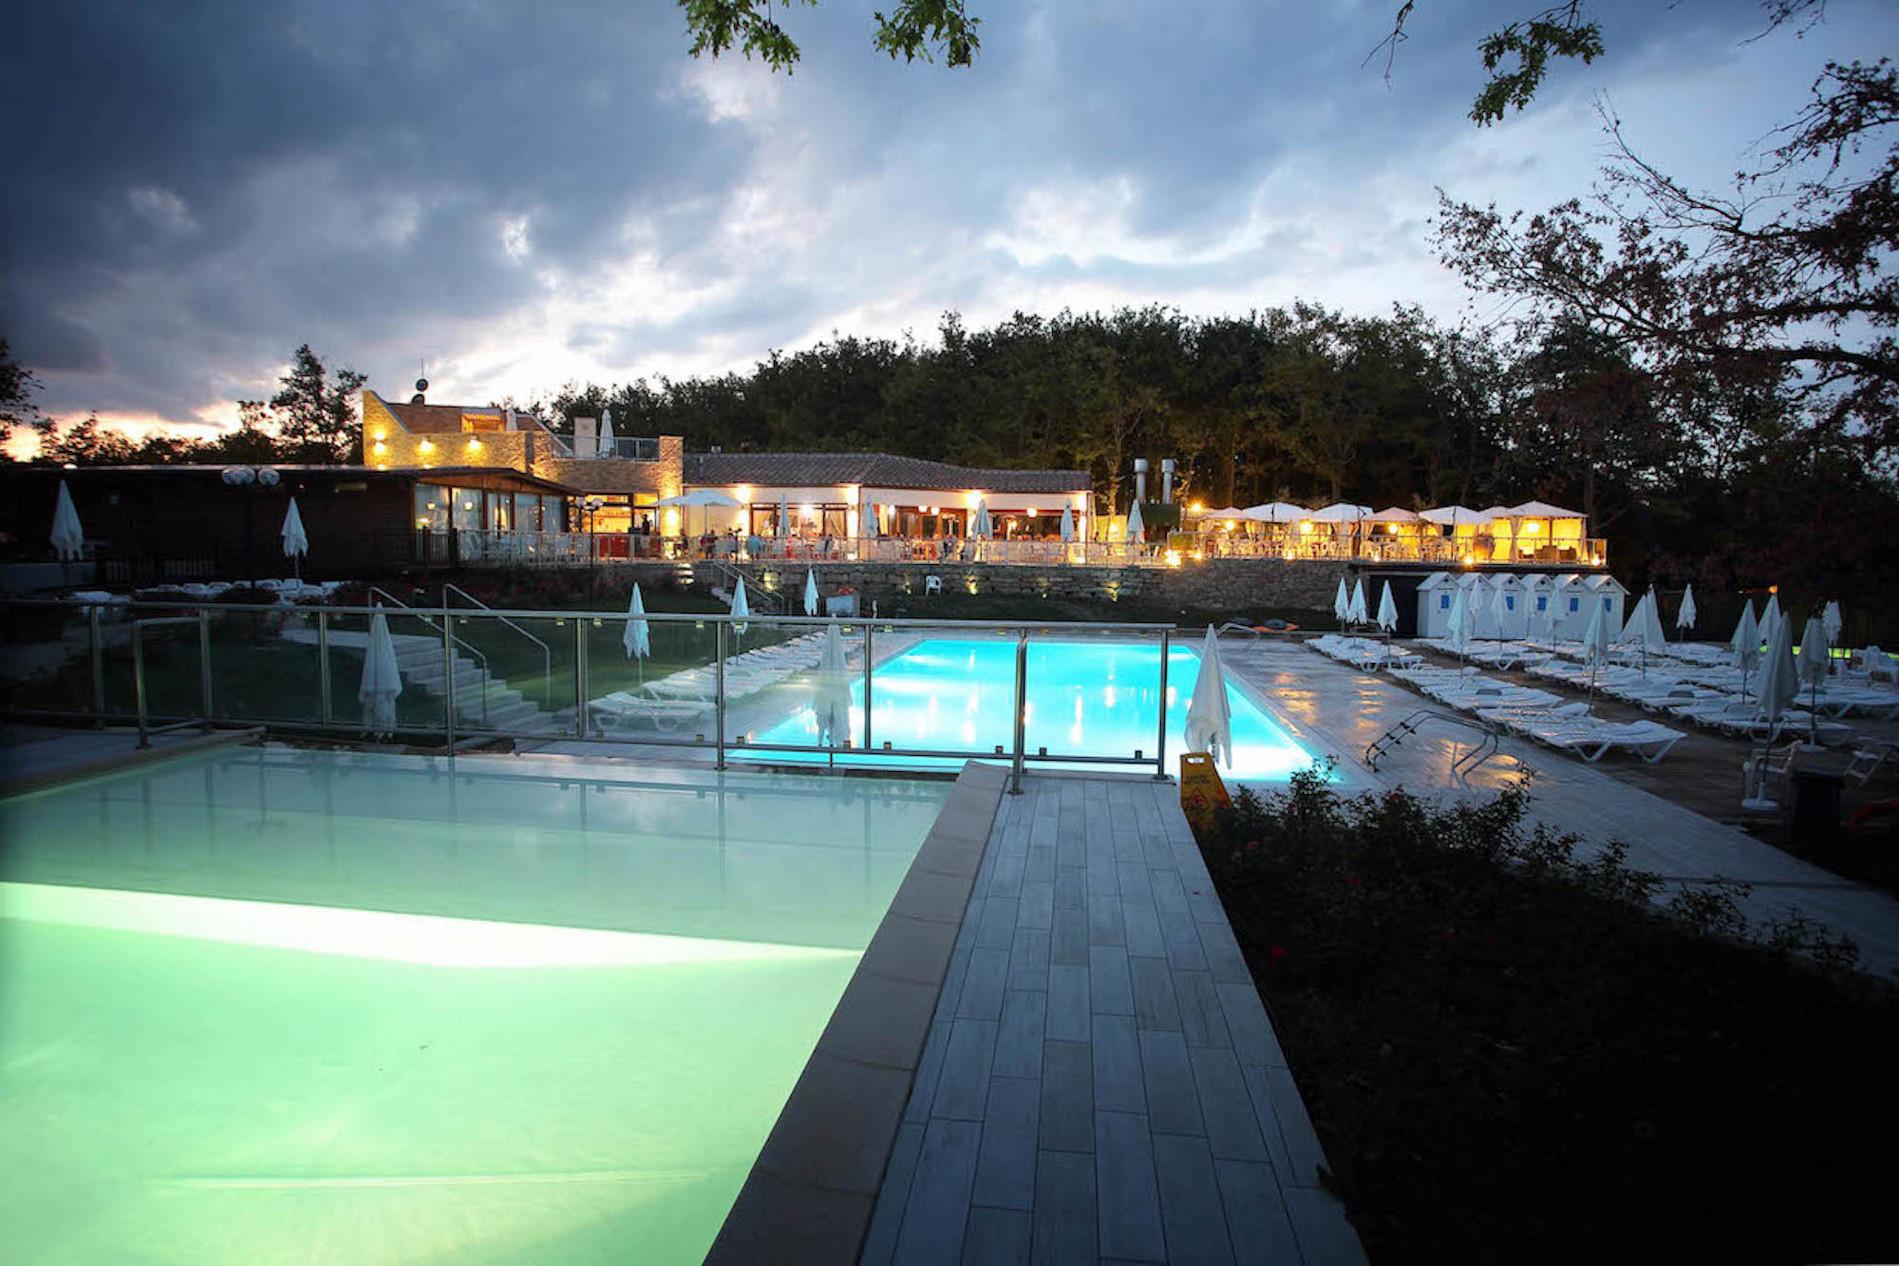 Glamping Resort Orlando In Chianti